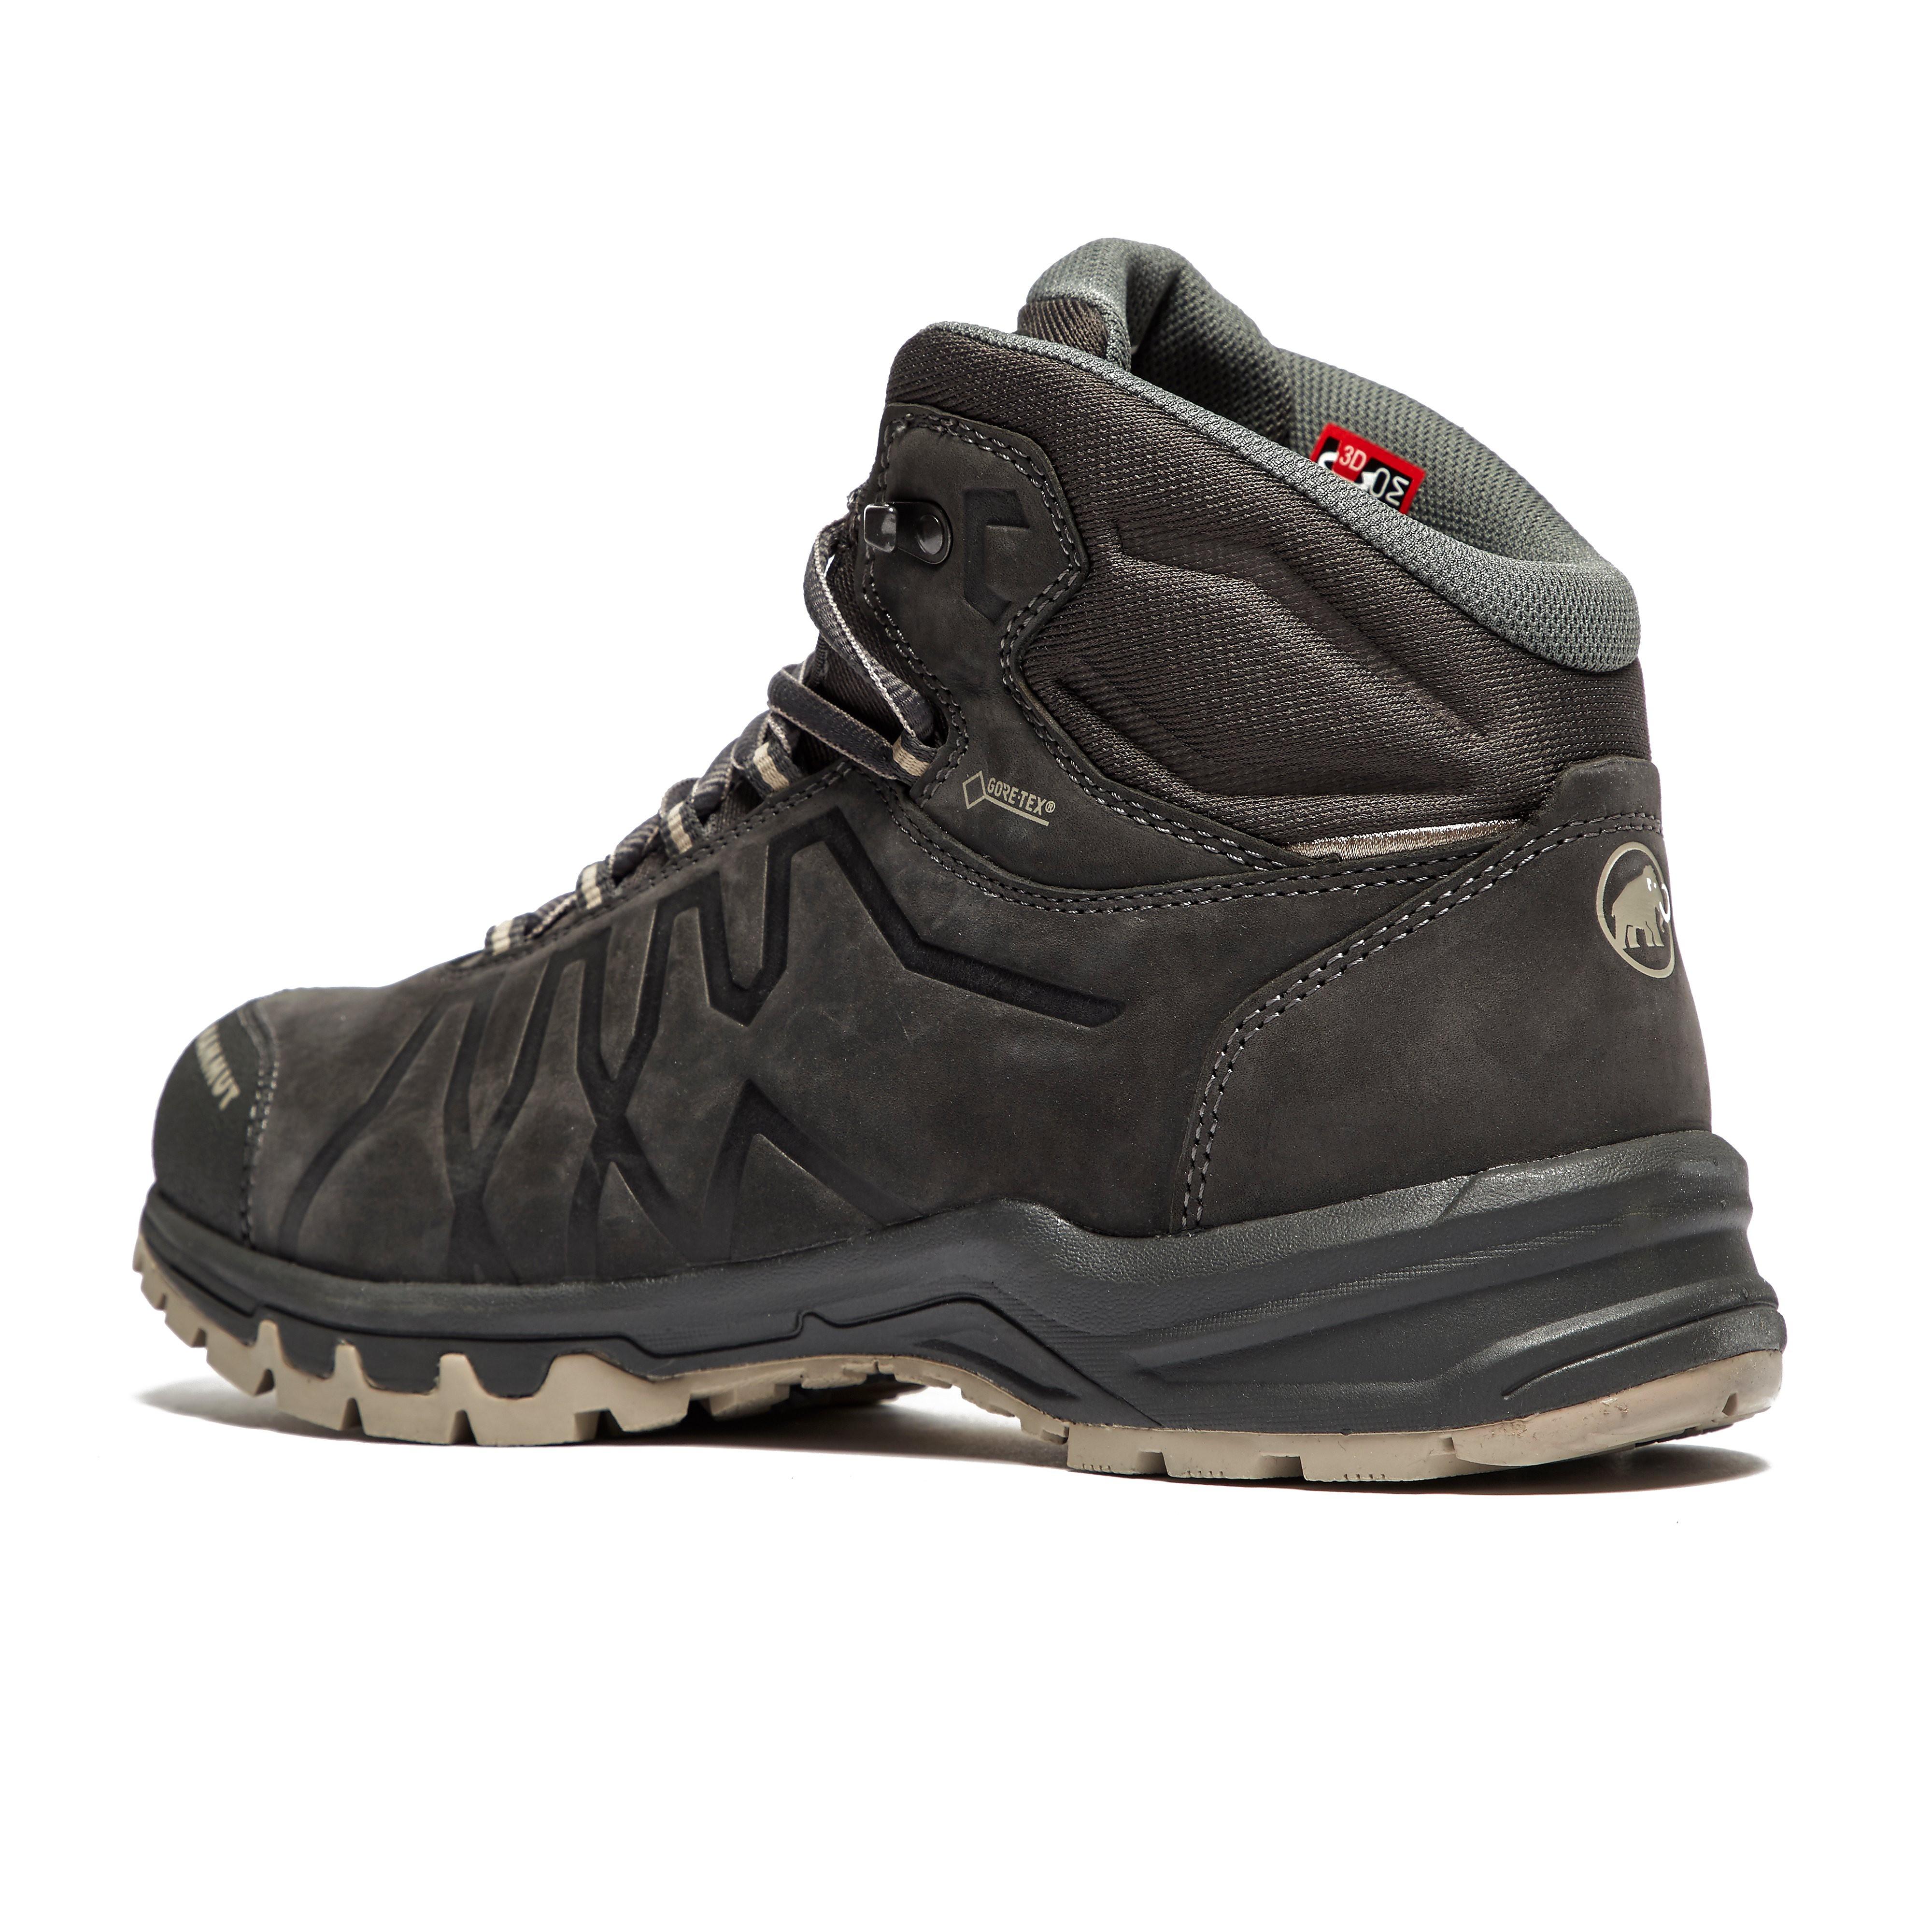 Mammut Mercury III Mid GTX Men's Walking Boots